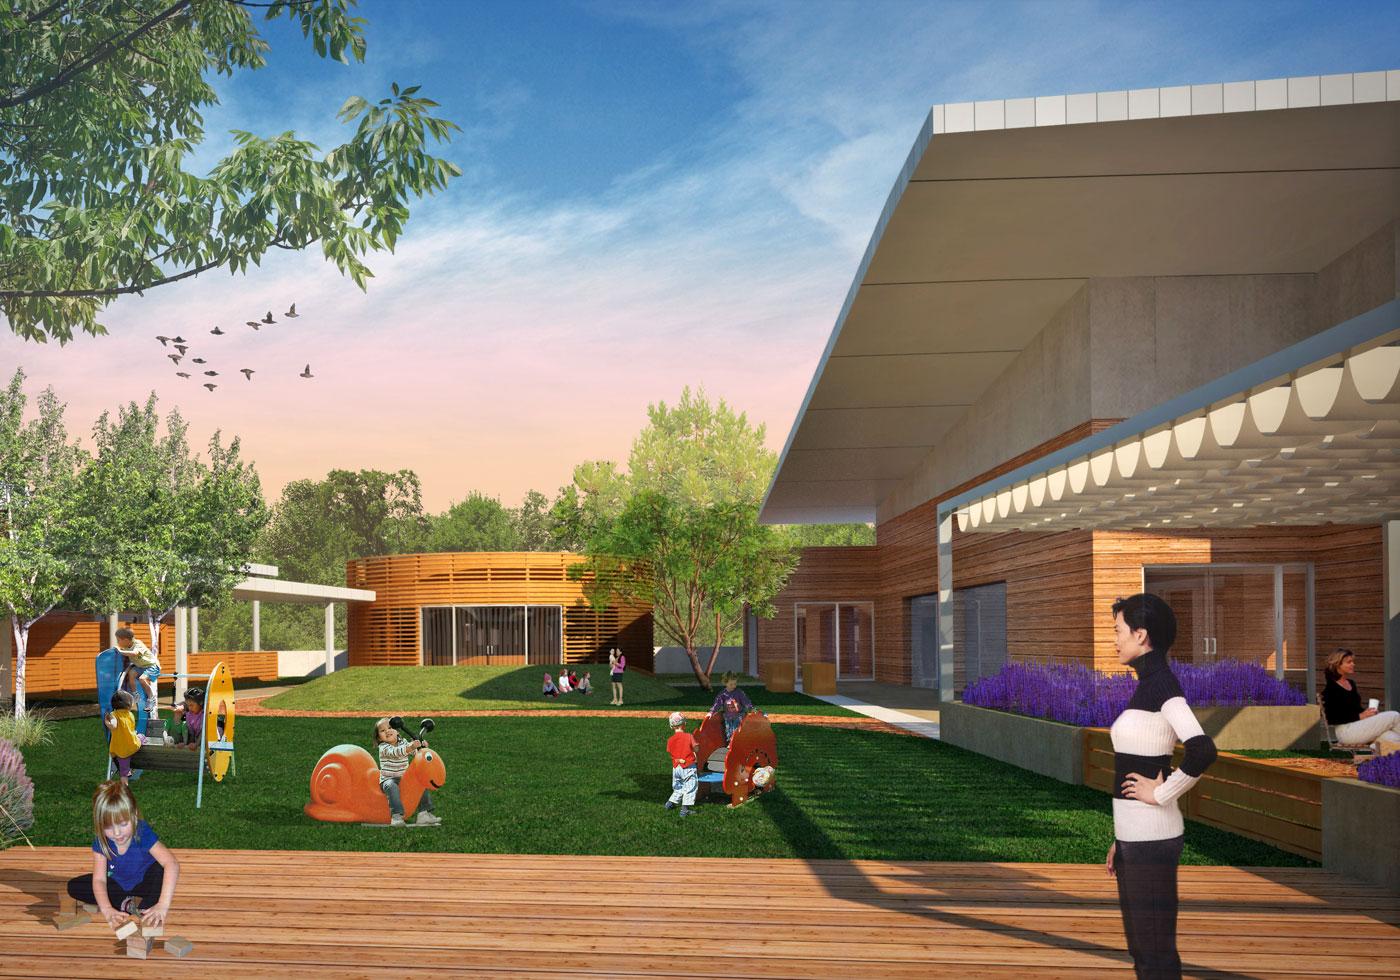 bel air presbyterian preschool bel air presbyterian preschool poon design inc 385